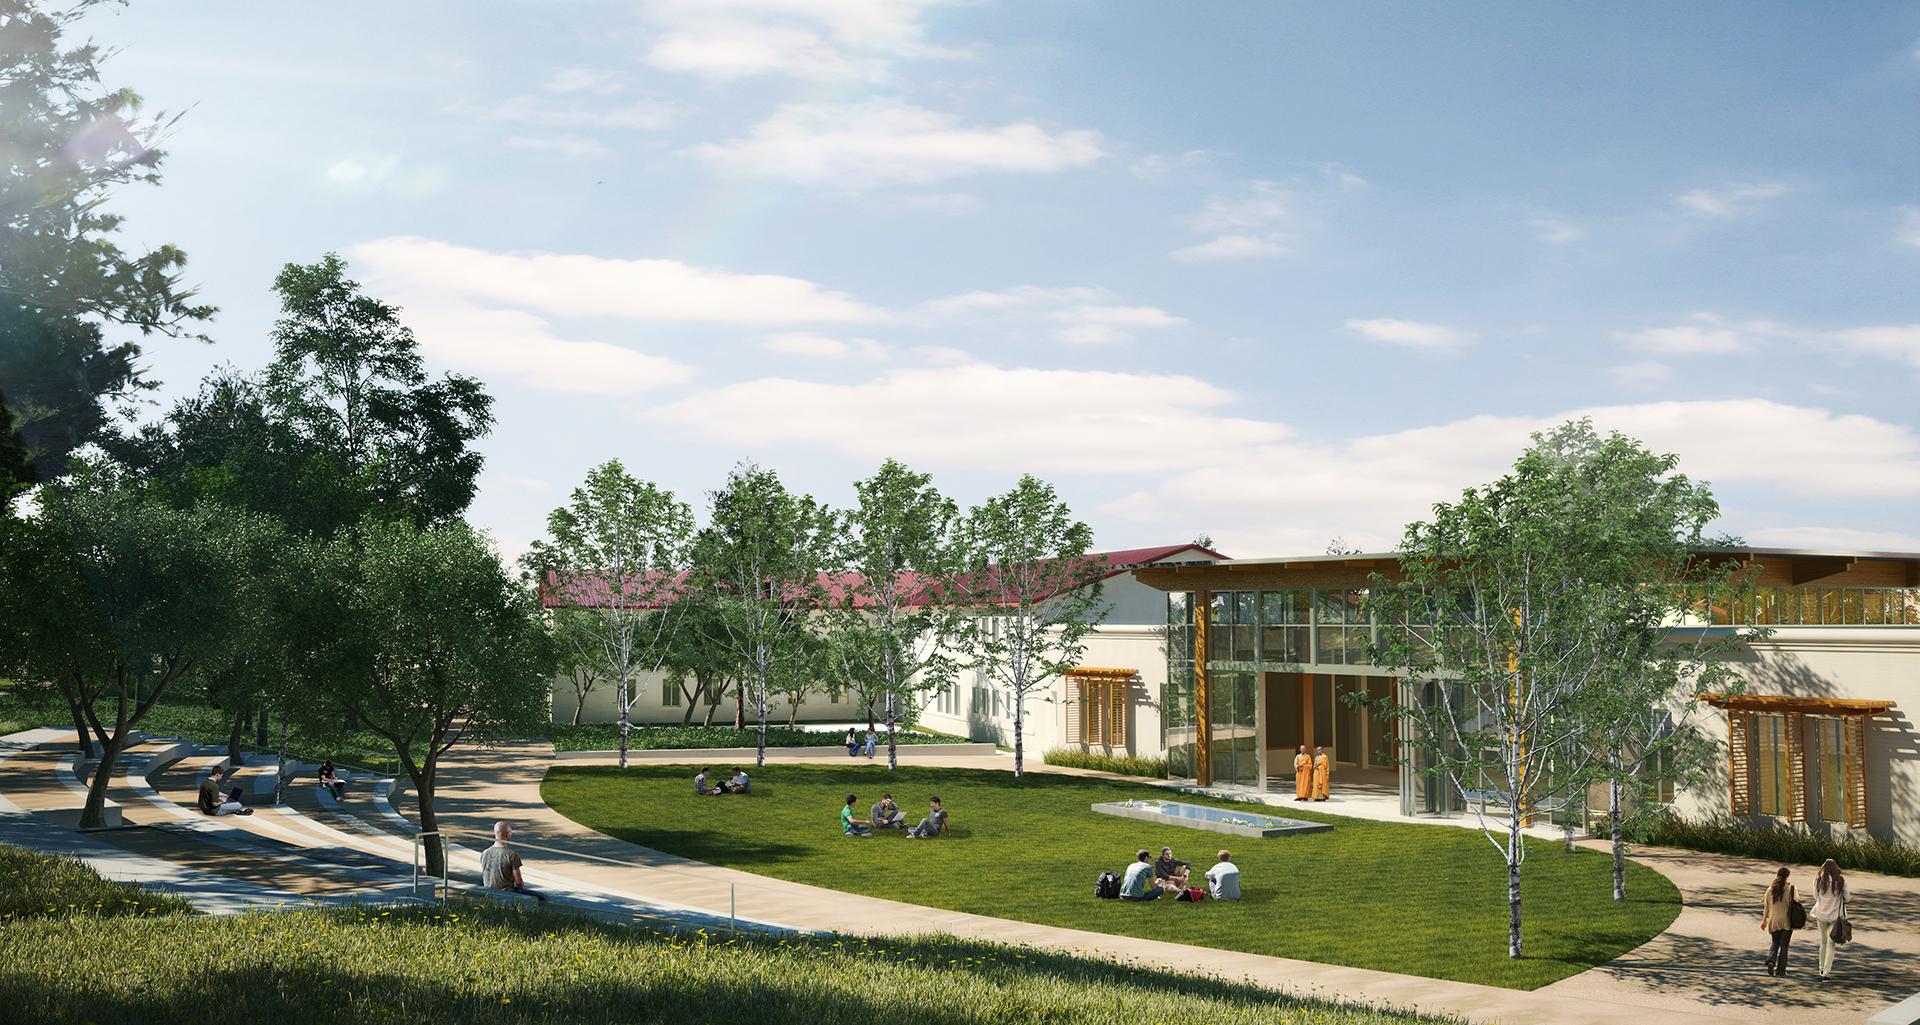 Dharma Realm Universitiy | Rendering by CISPA